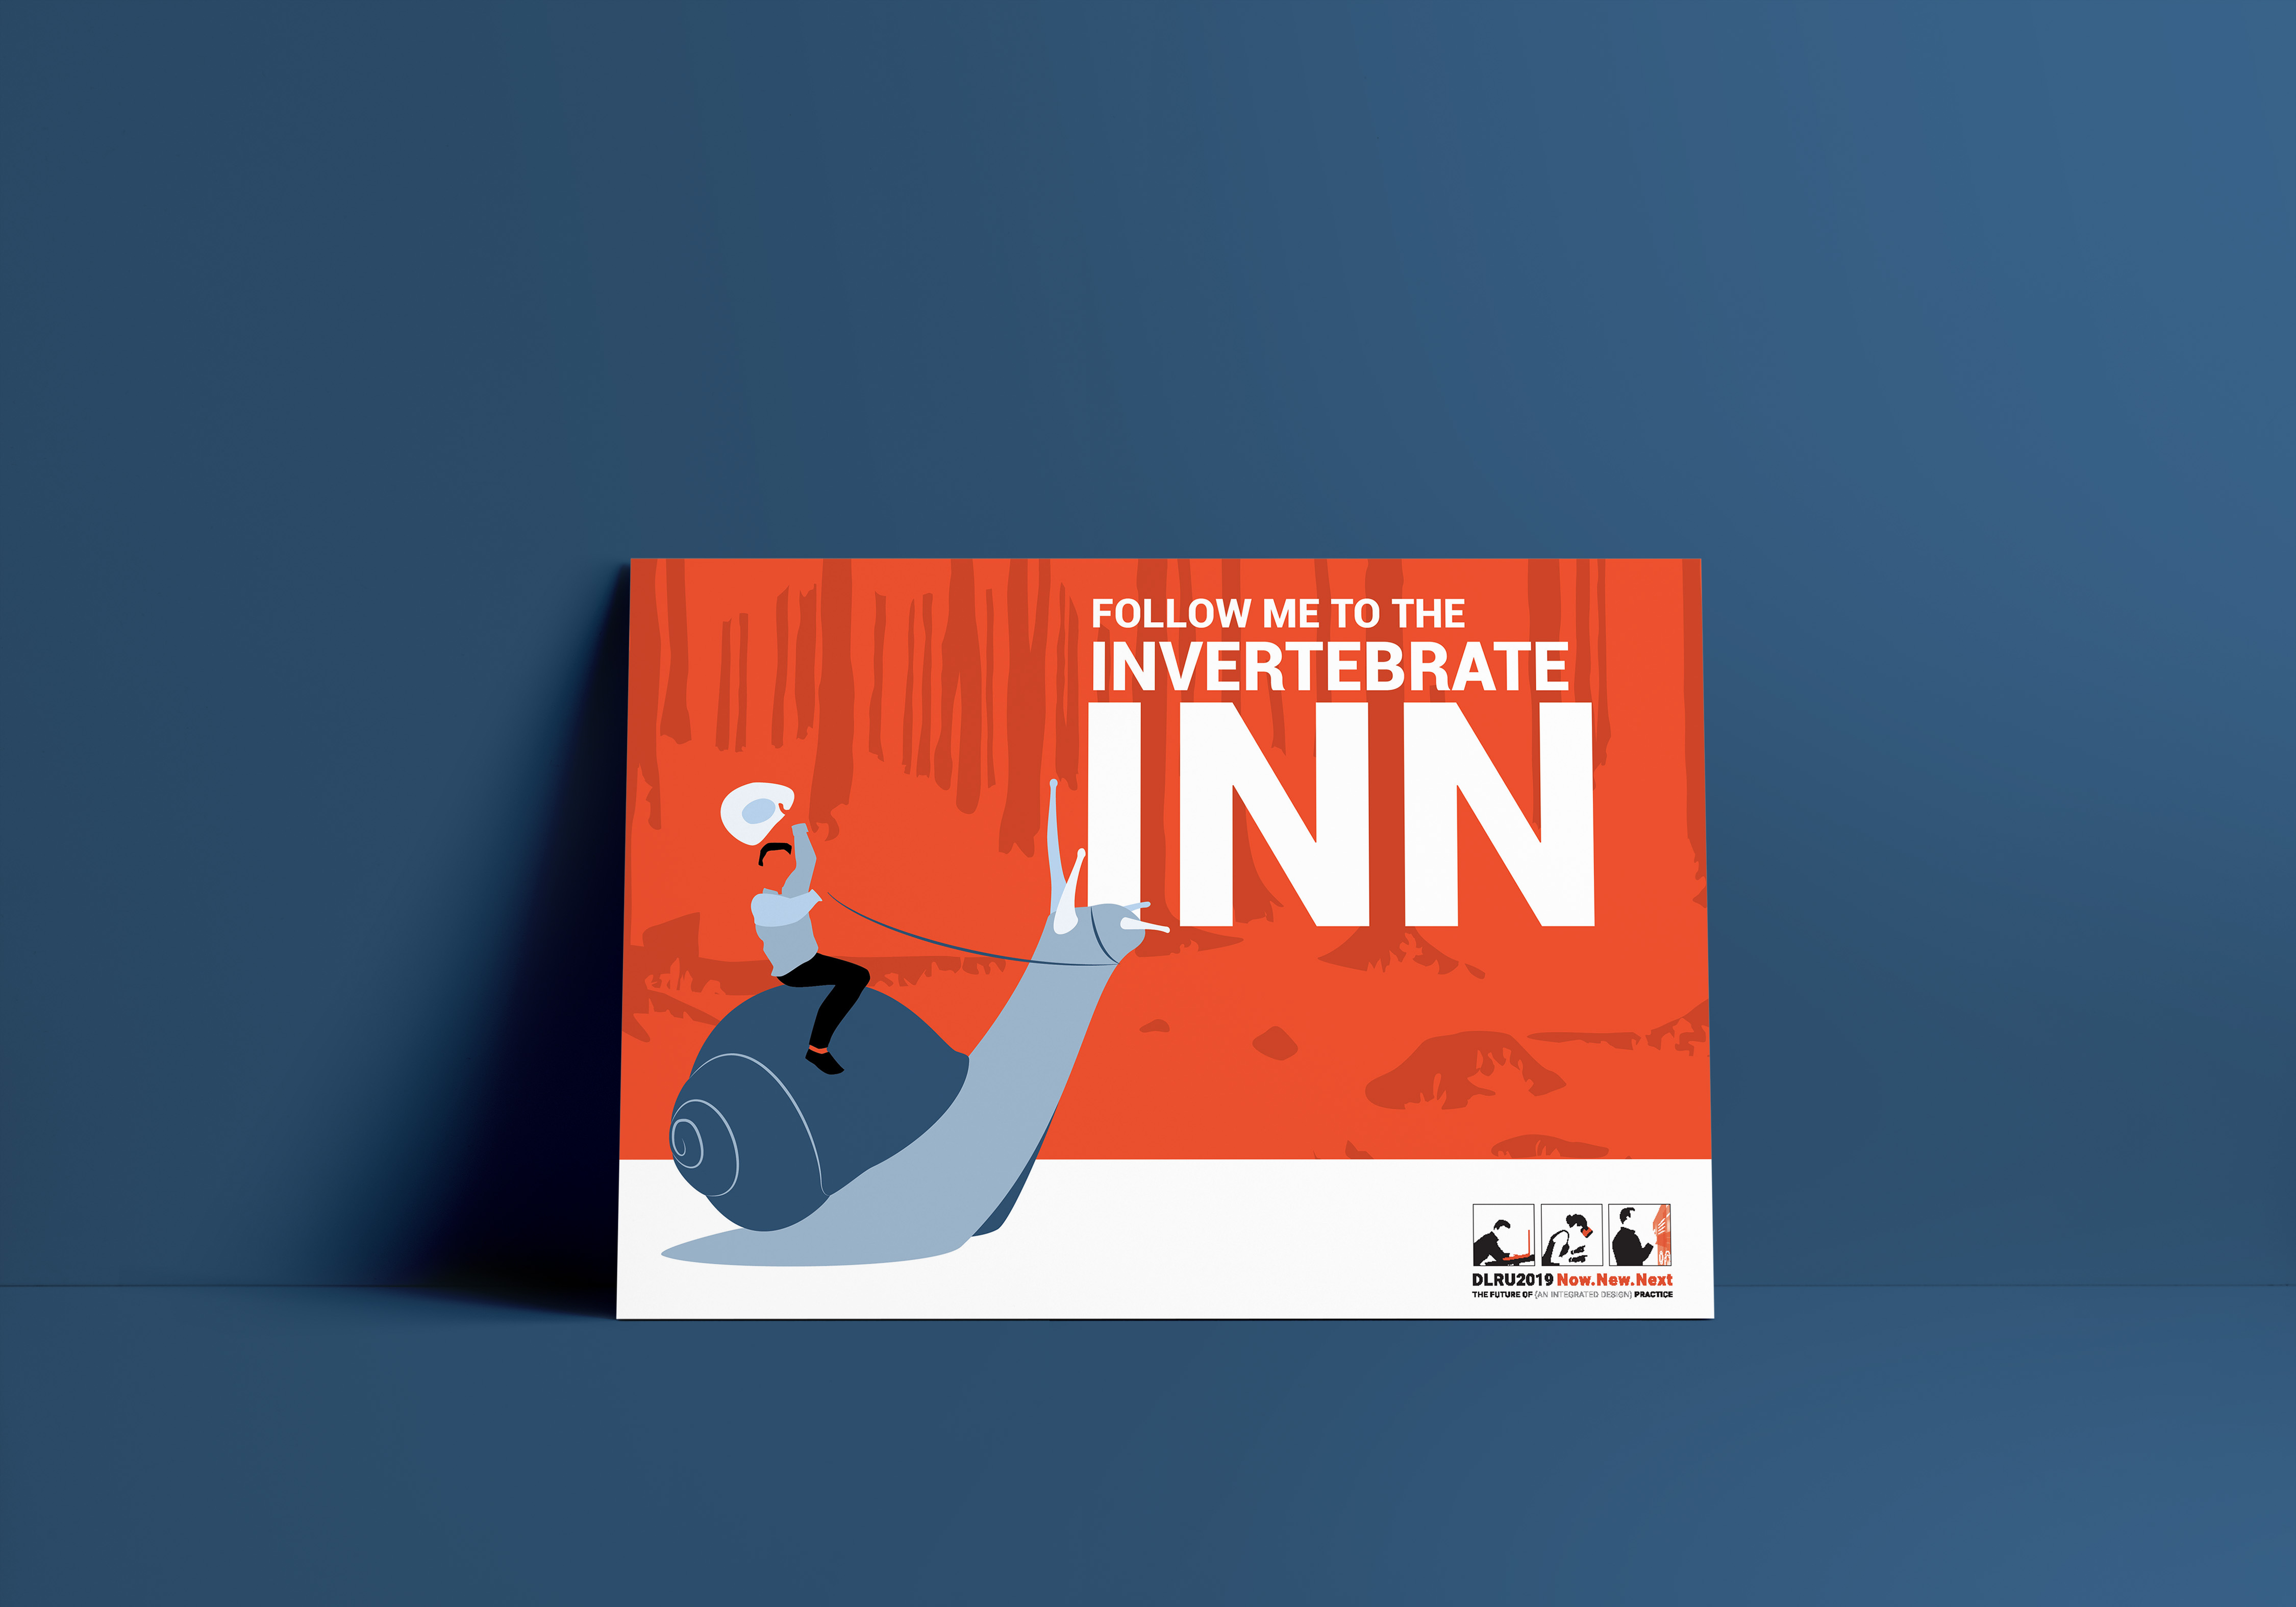 Invertebrate Inn